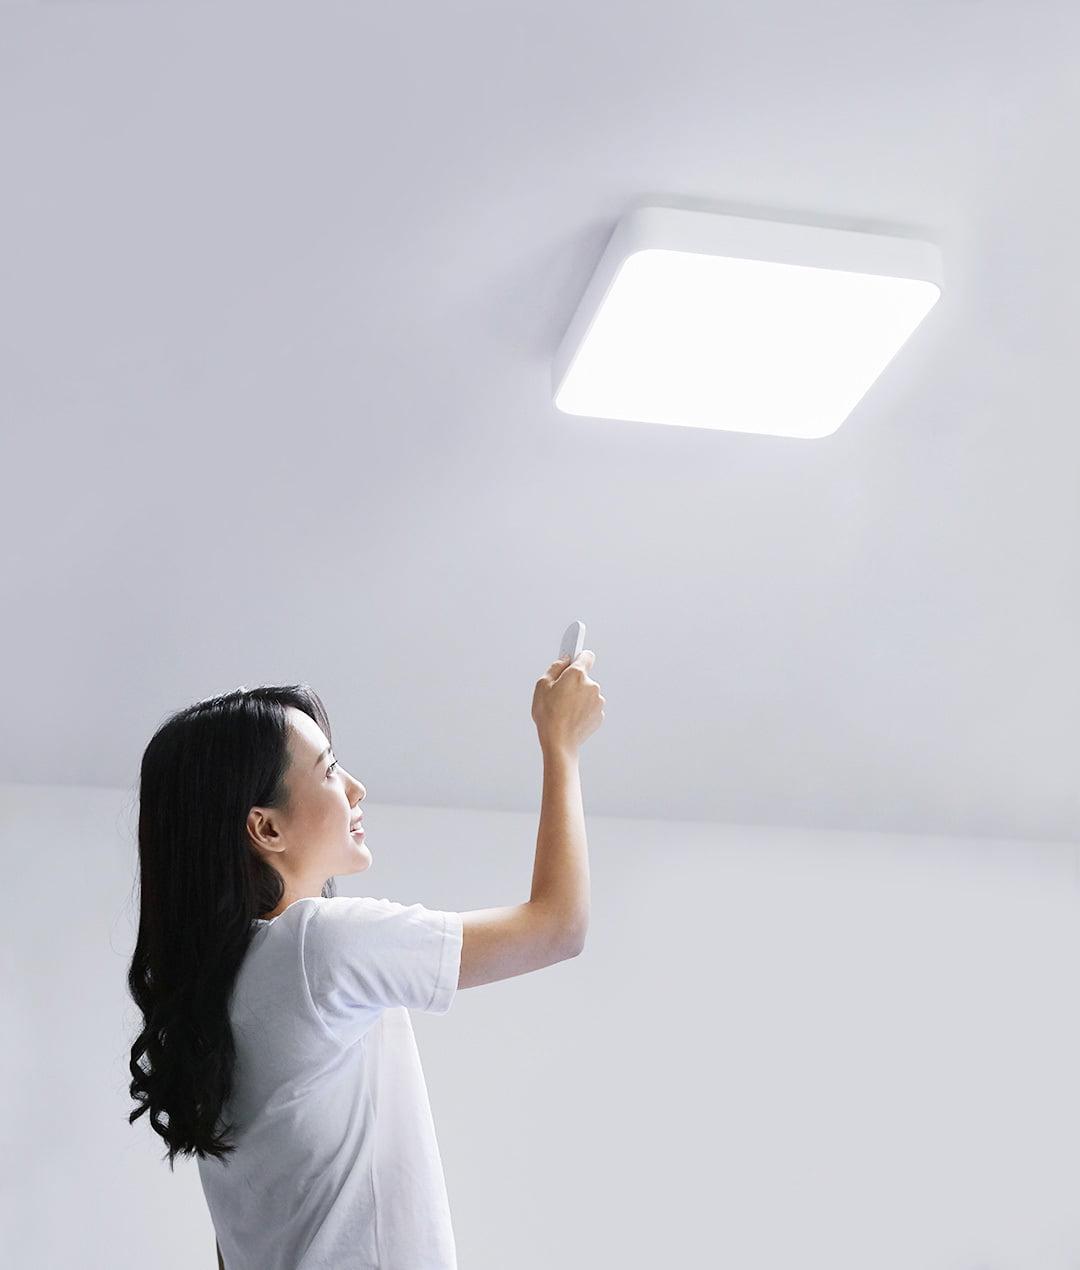 Đèn LED ốp trần Yeelight Plus